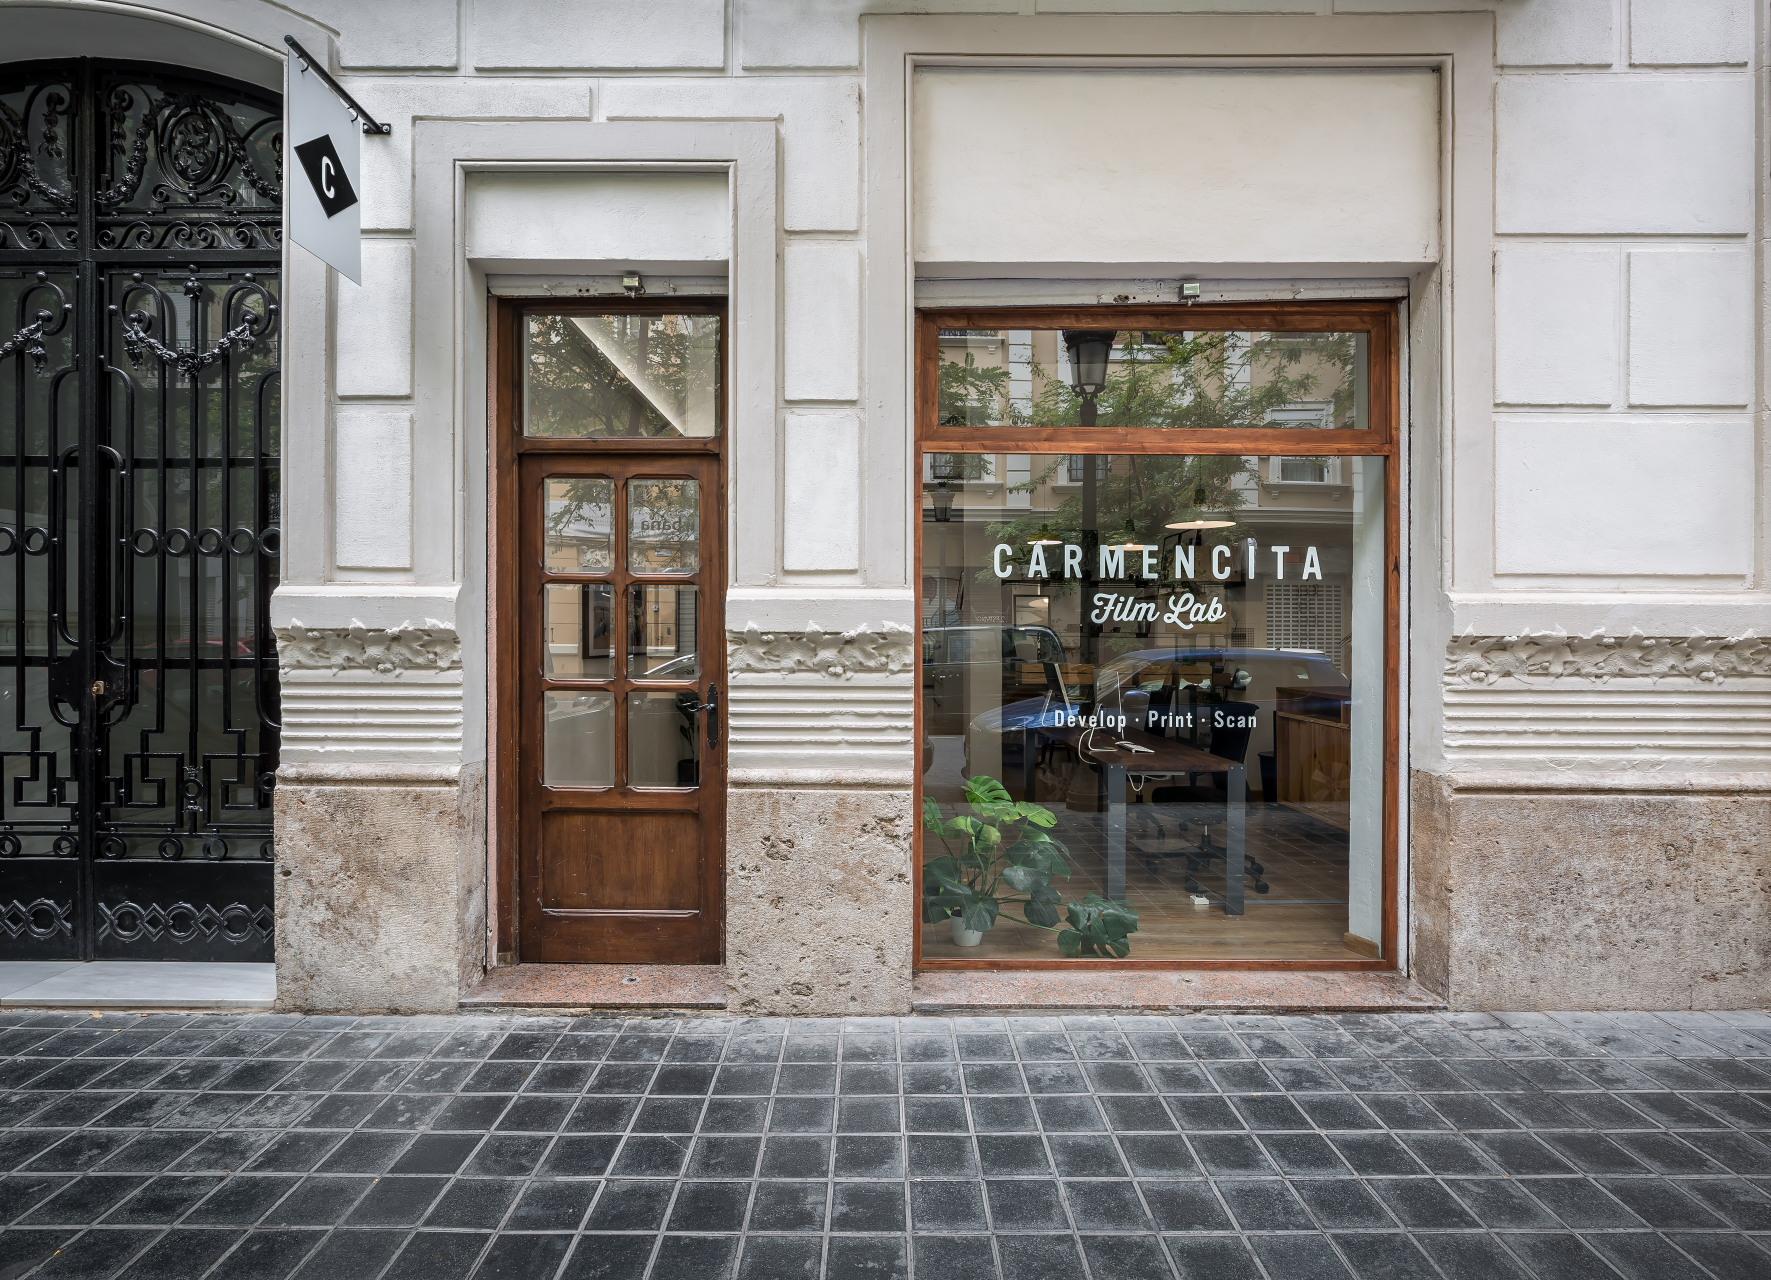 fotografia-arquitectura-interiorismo-valencia-german-cabo-boubau-carmencita-carmencitafilmlab (1)